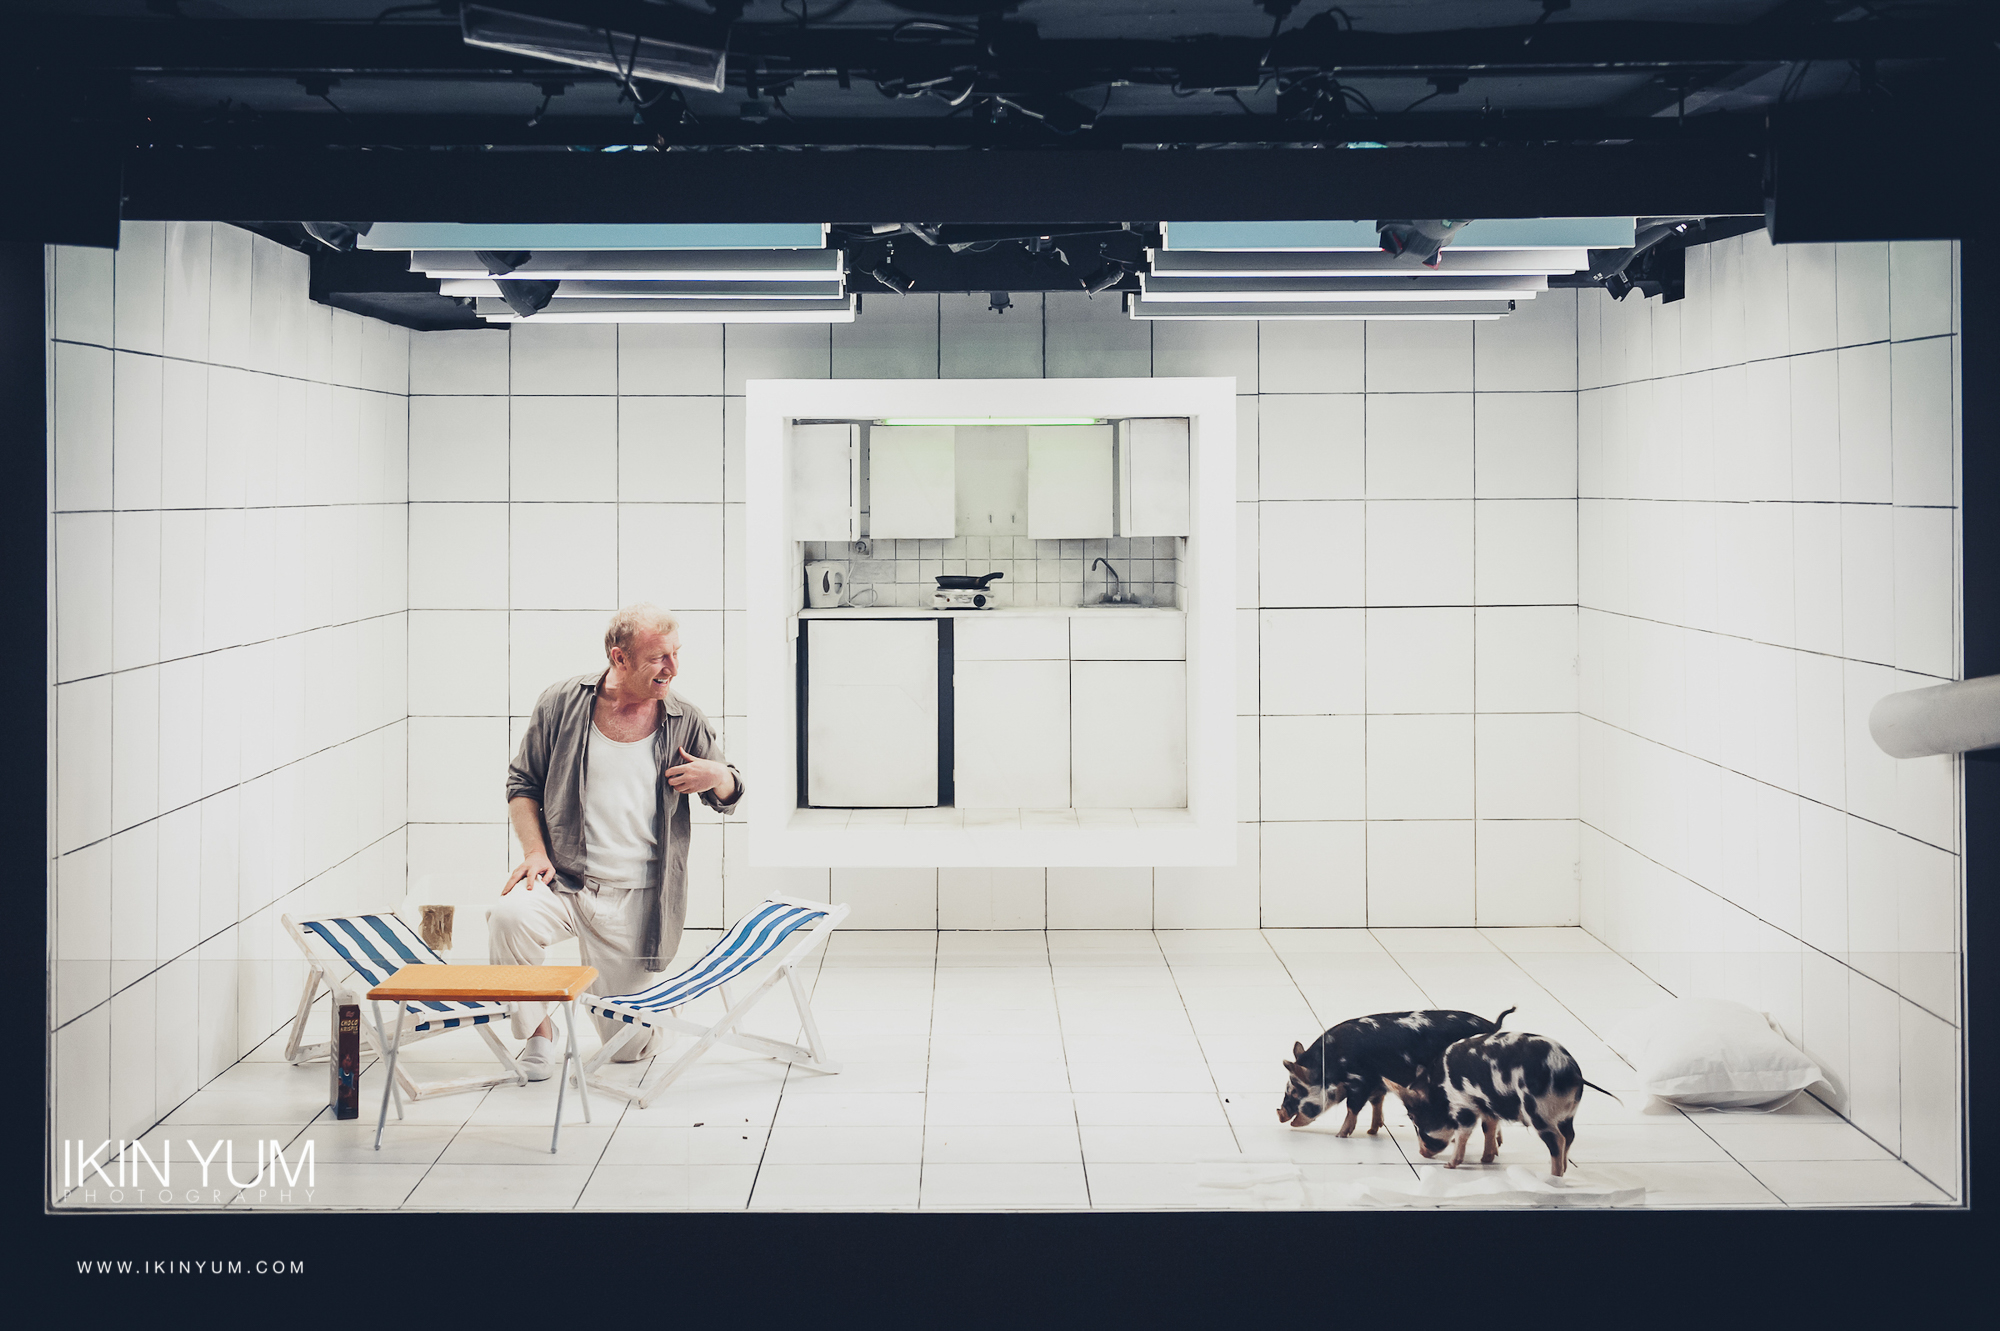 Goya - Gate theatre - Ikin Yum Photography-026.jpg